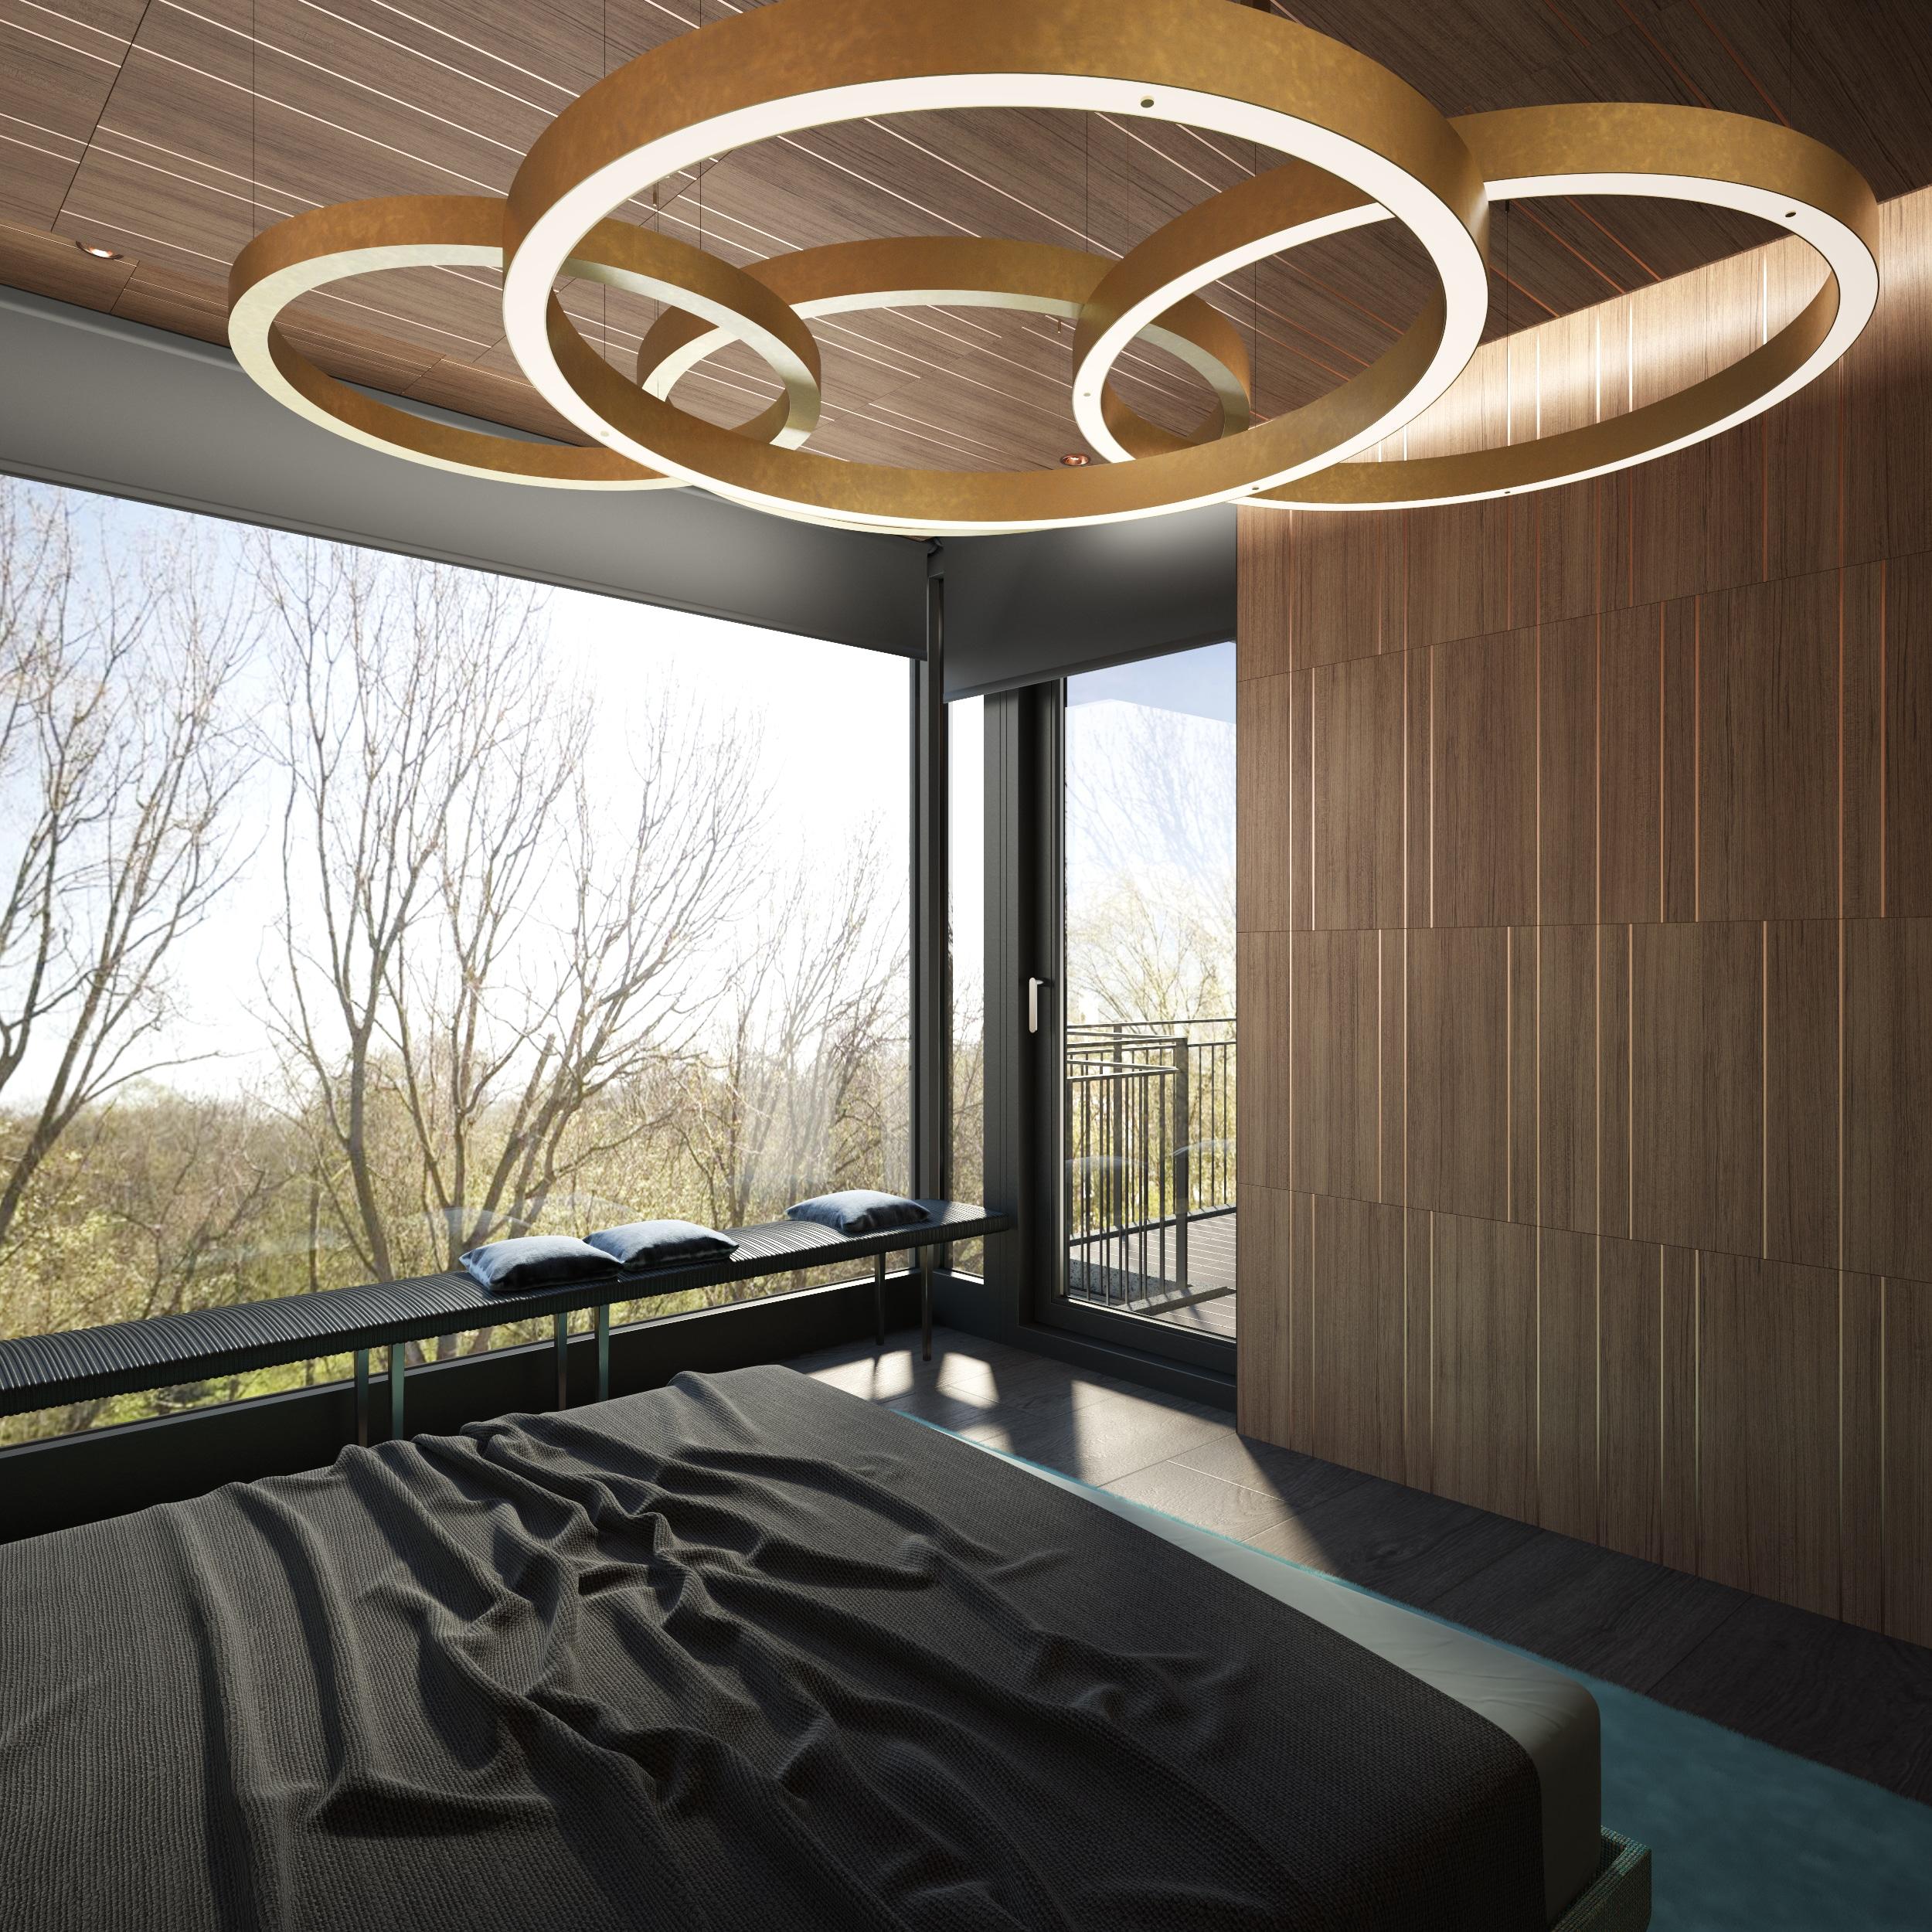 Wall textures bedroom and lighting Dis Studio interior design